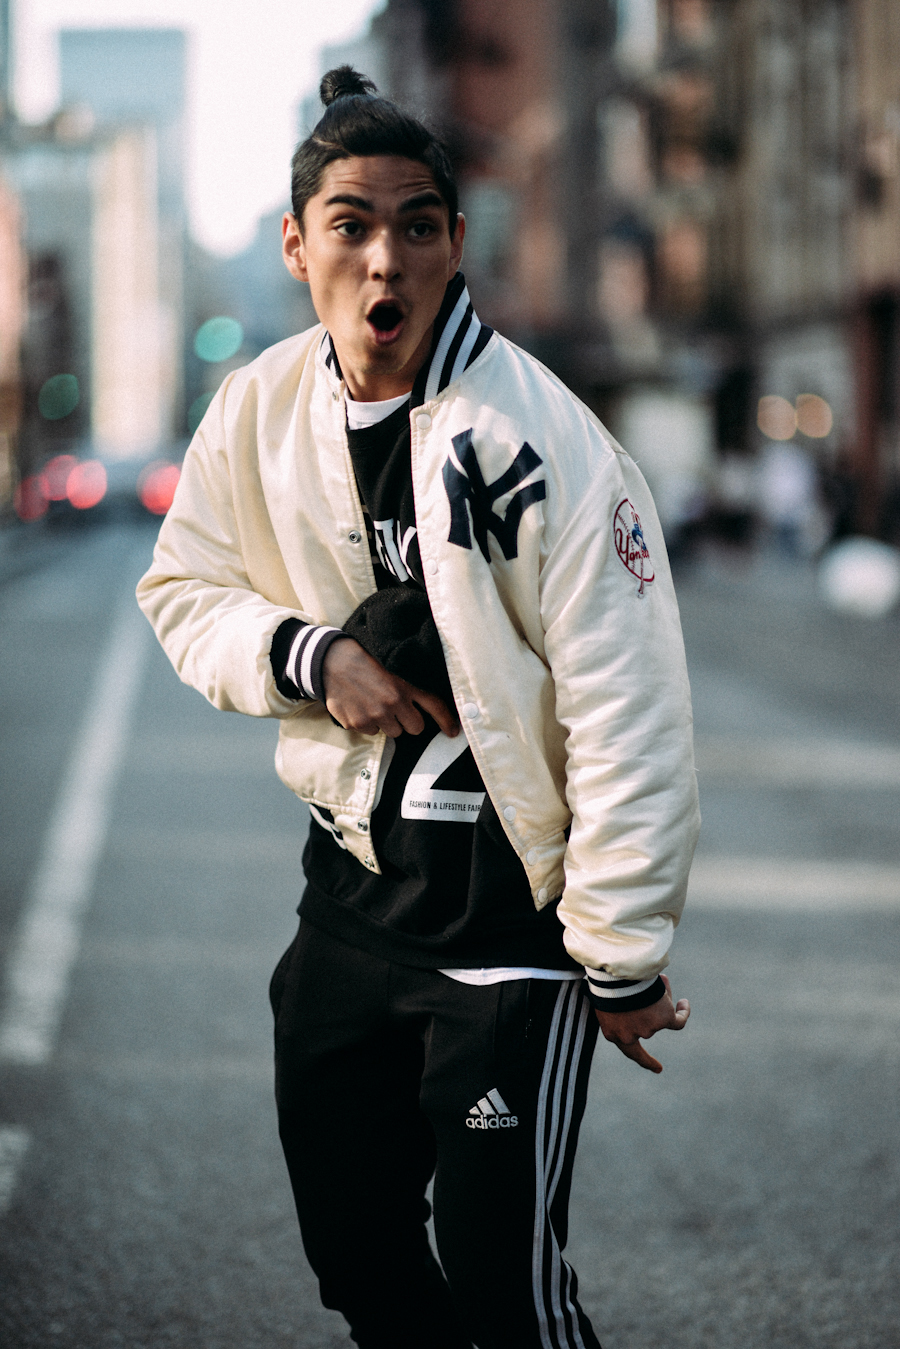 Get-Out-The-Street-Dapper-Lou-Mens-Fashion-Blog.jpg